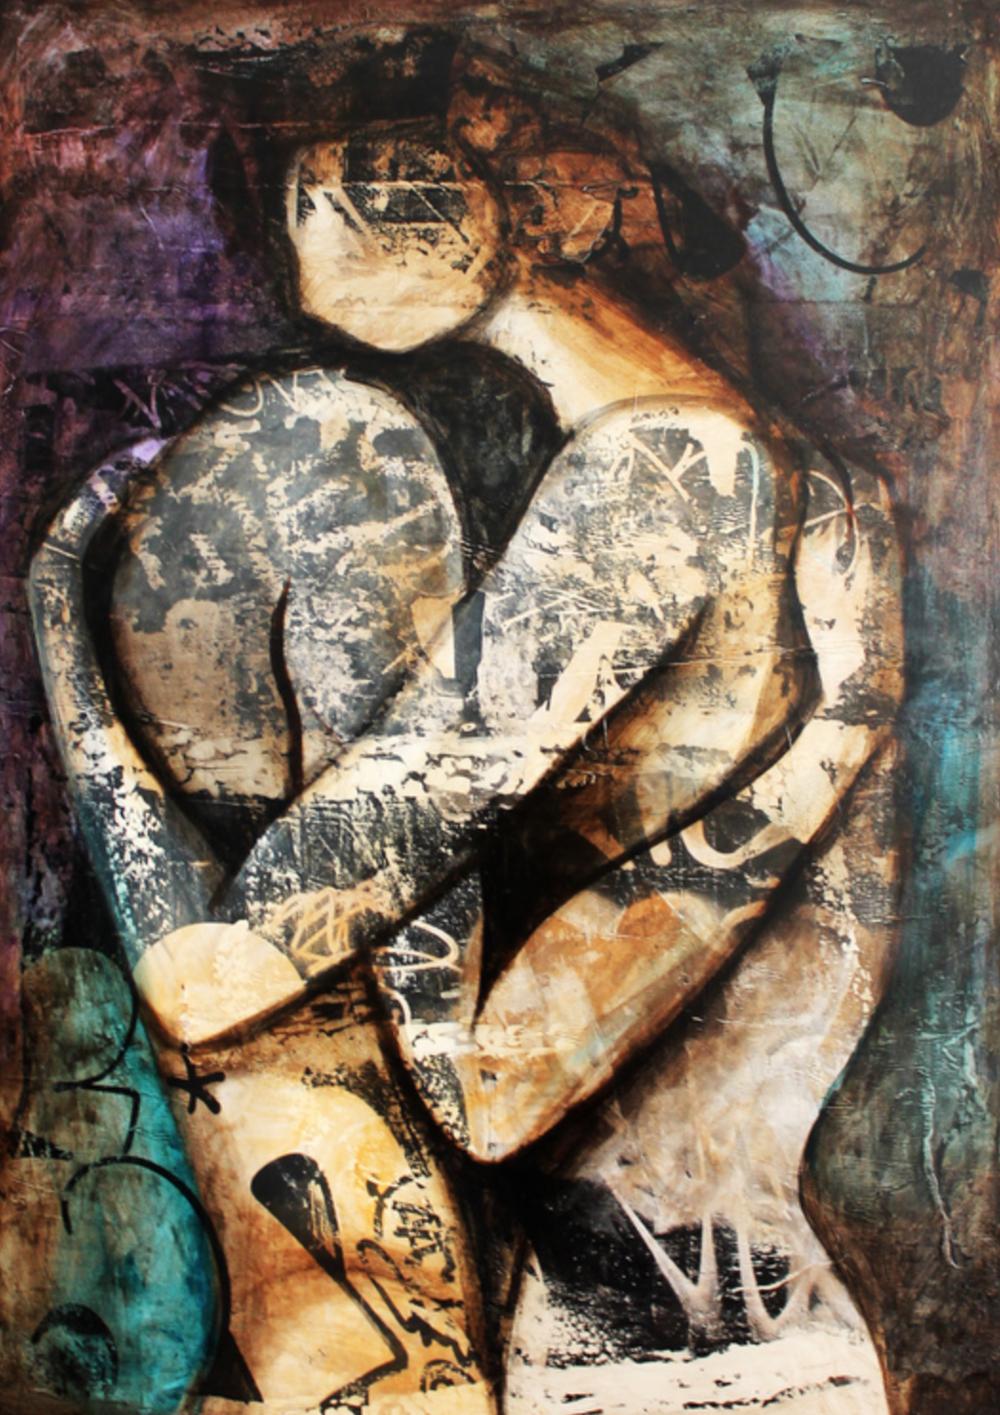 Esteban Kremen - http://www.kremenart.comCollage, oil, acrylic paint, on canvas,